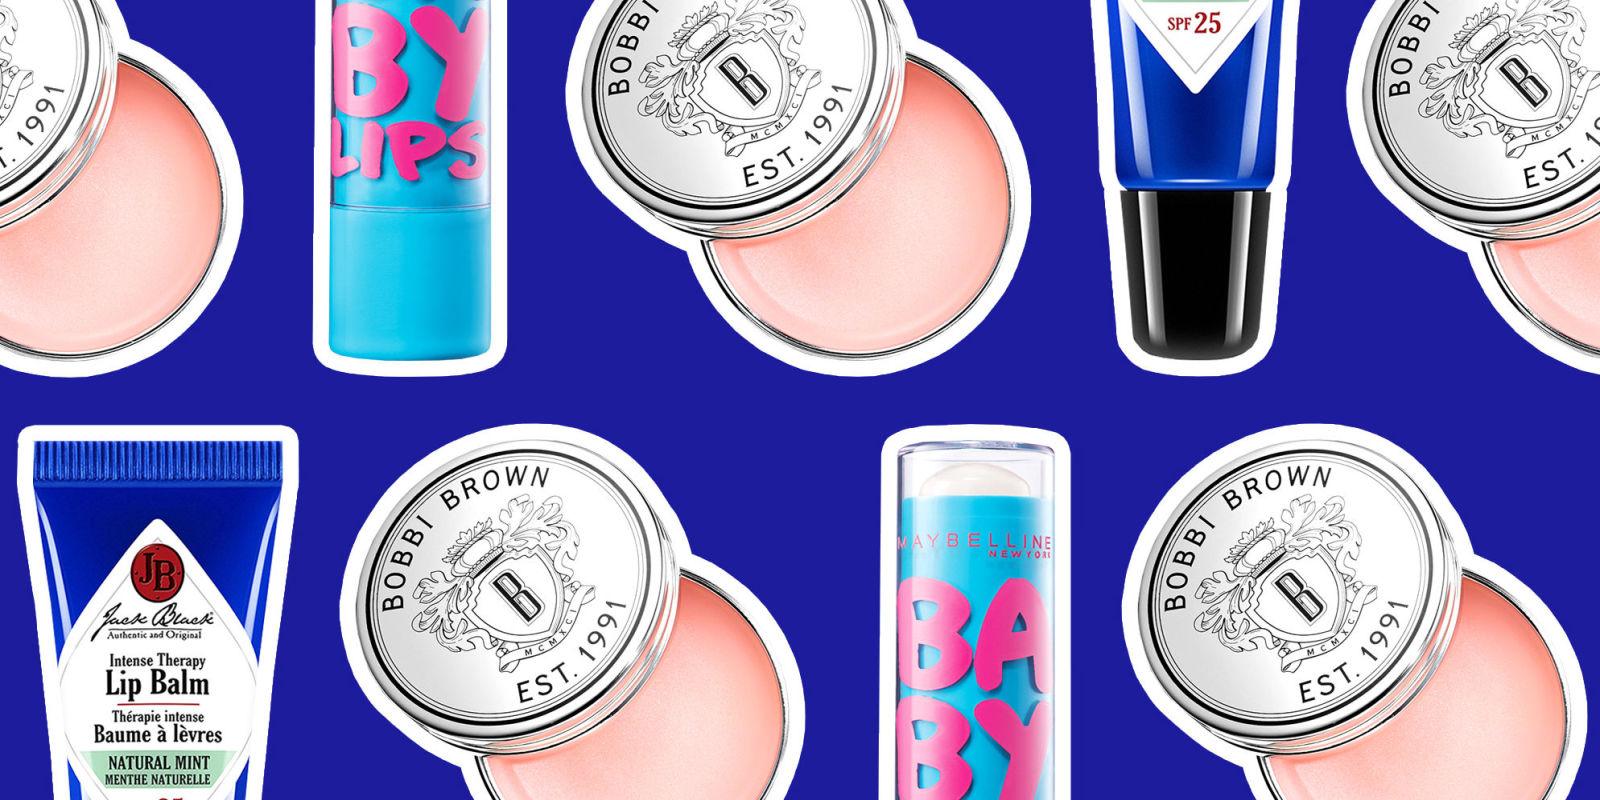 10 Best Lip Balms for Fall 2018